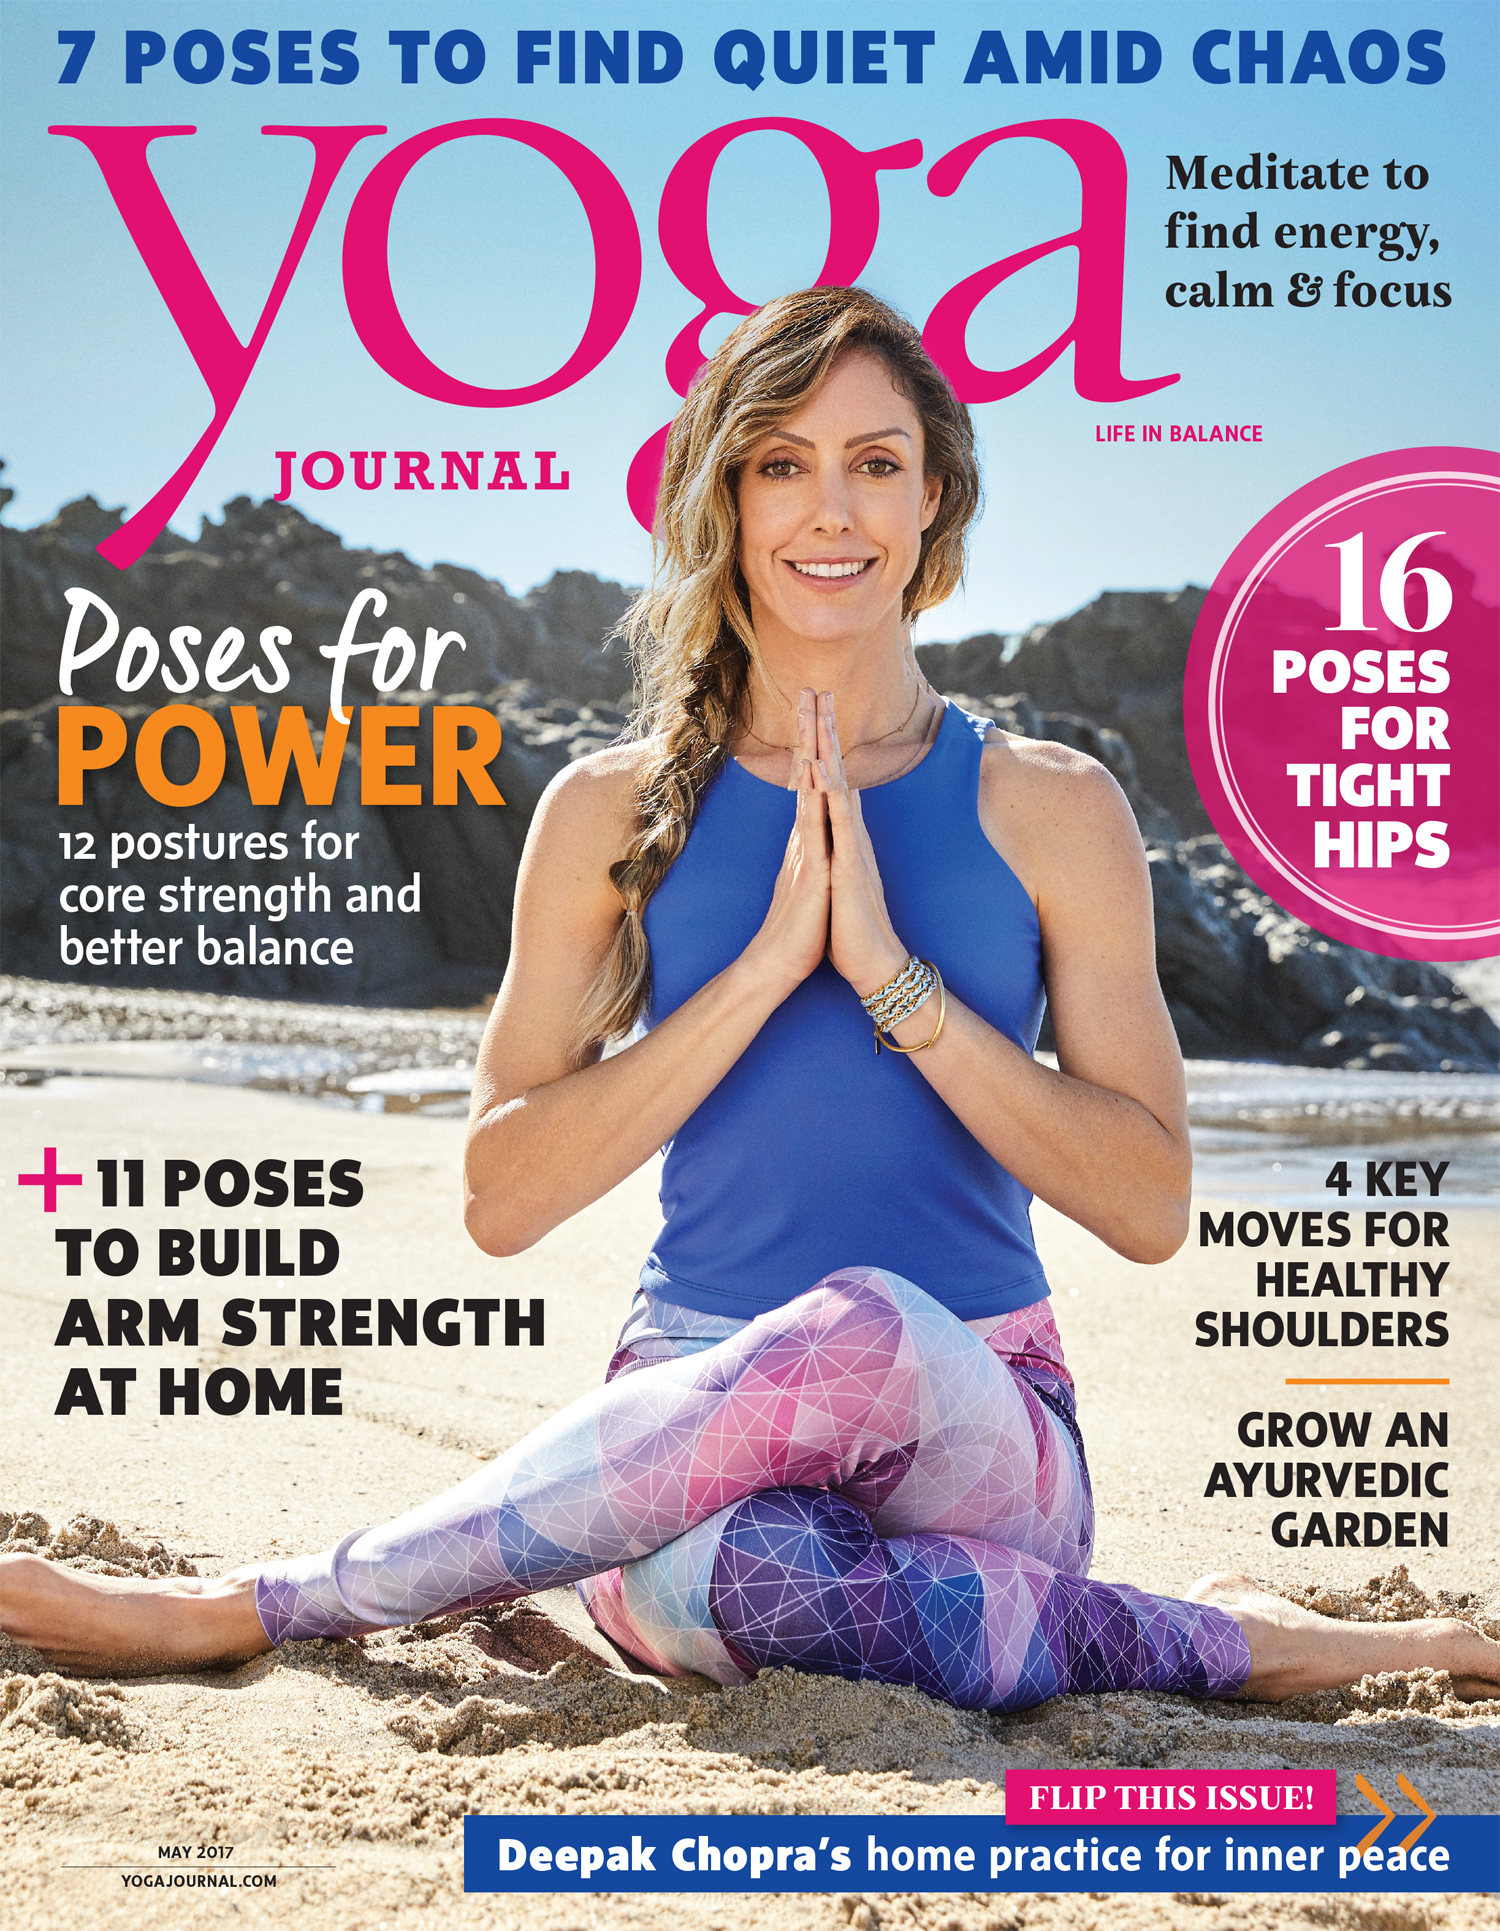 CV1_yoga_may_17.jpg